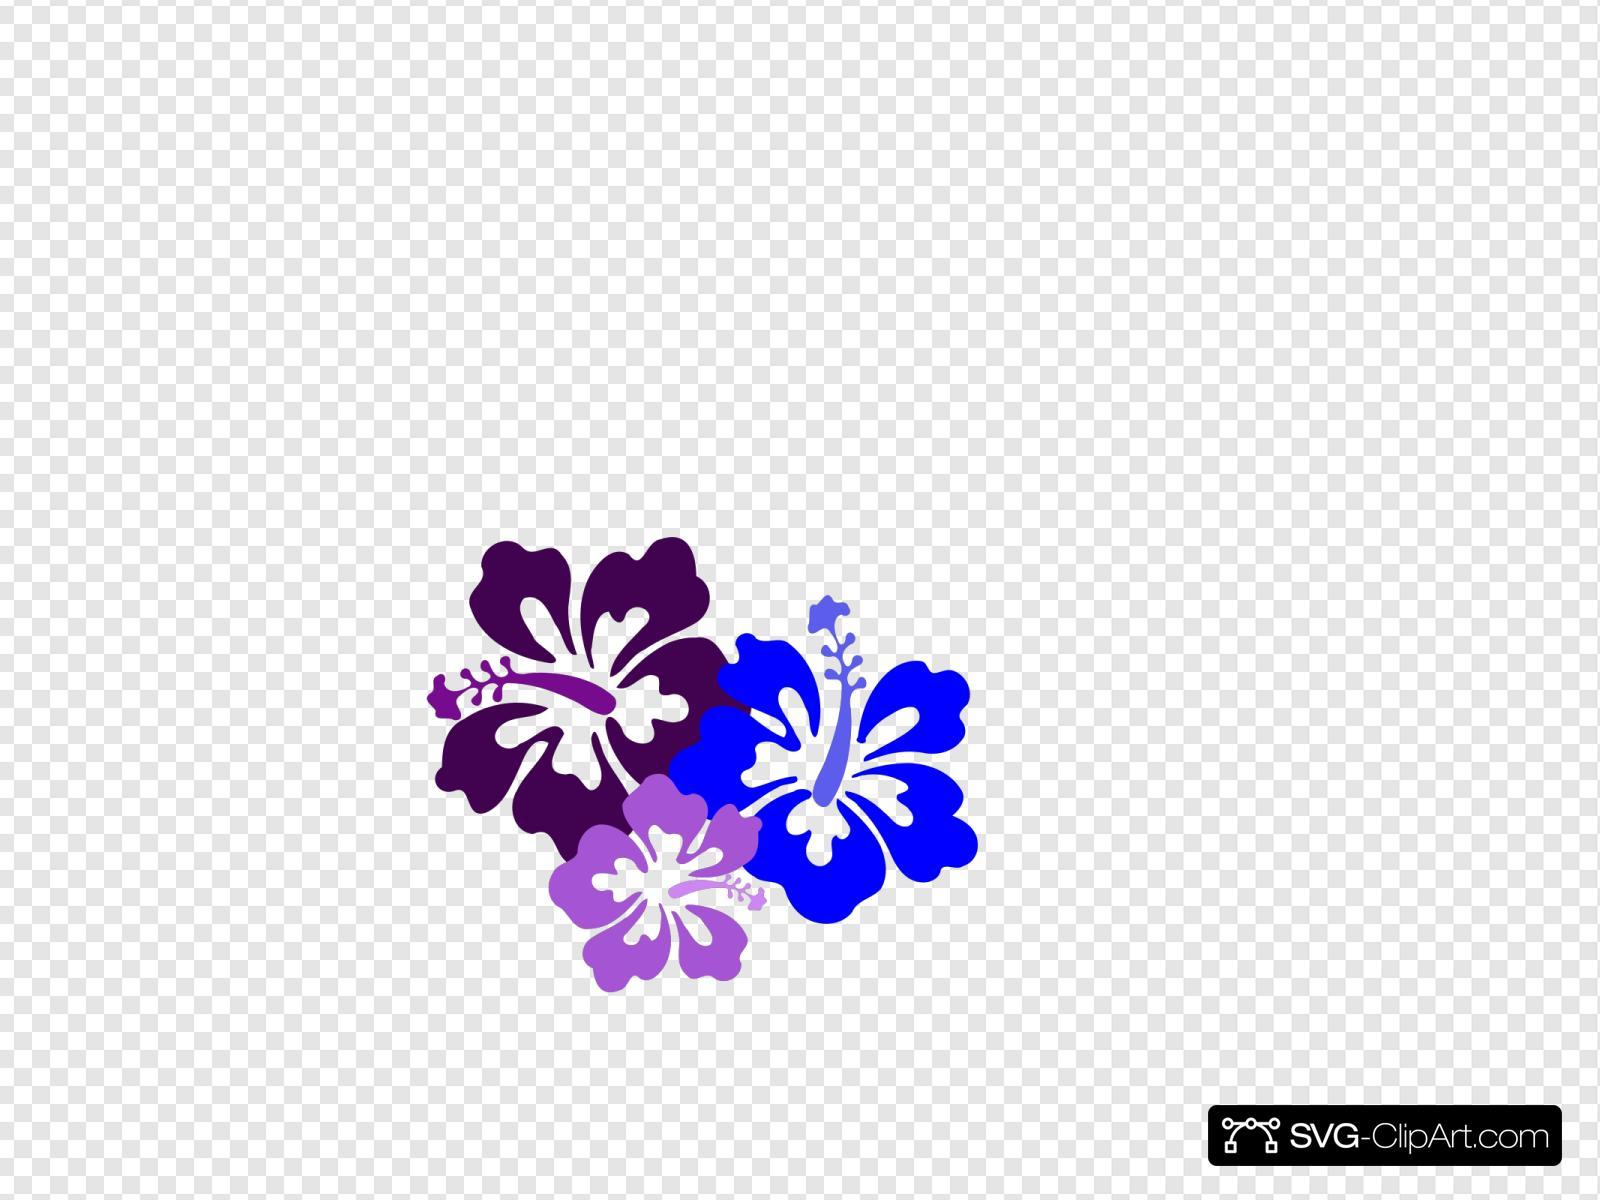 Hibiscus 15 SVG Vector, Hibiscus 15 Clip art - SVG Clipart